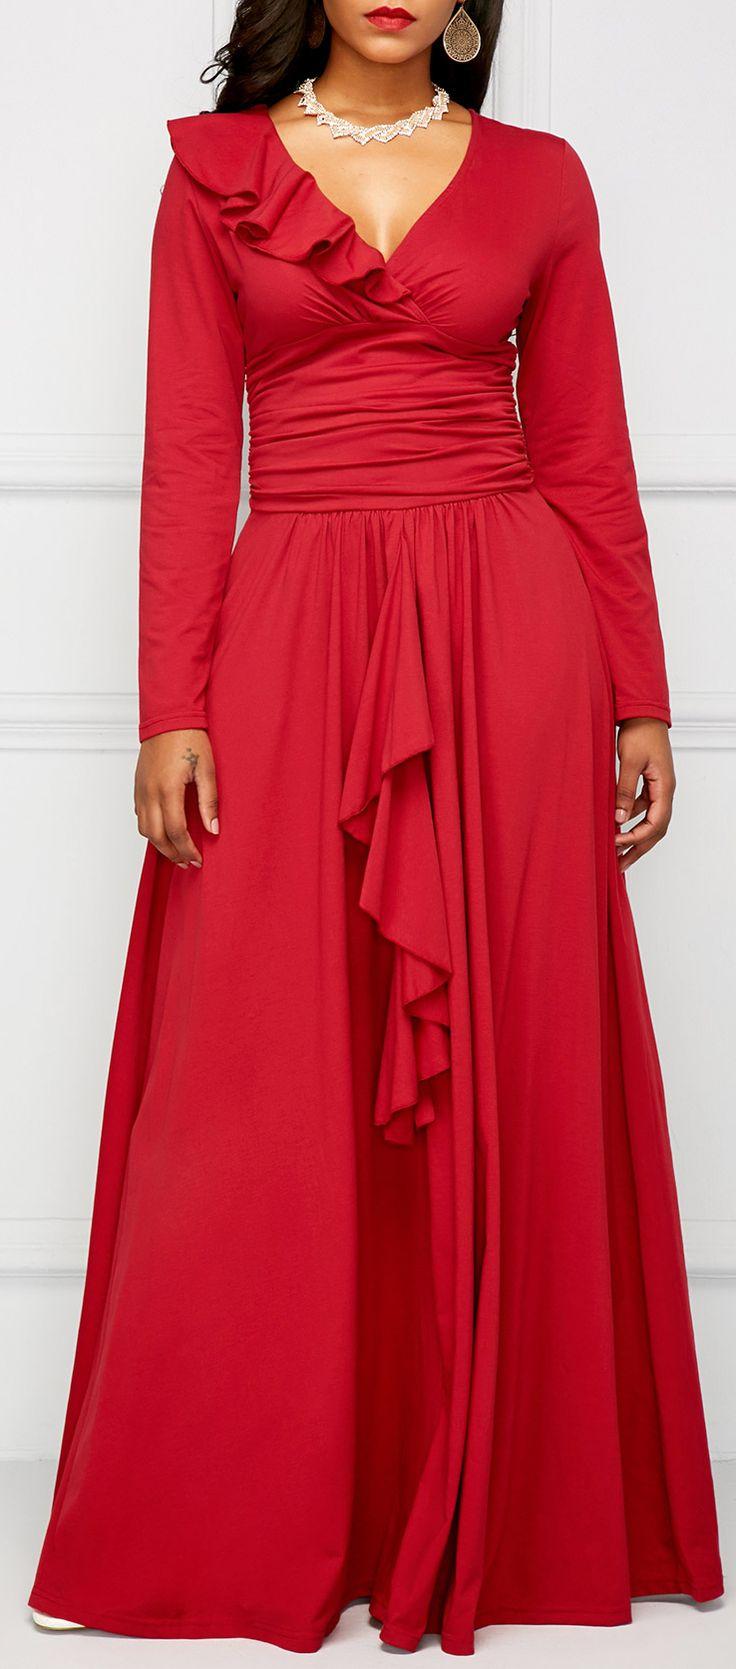 Flouncing Ruched Long Sleeve Red Elegant Dress.